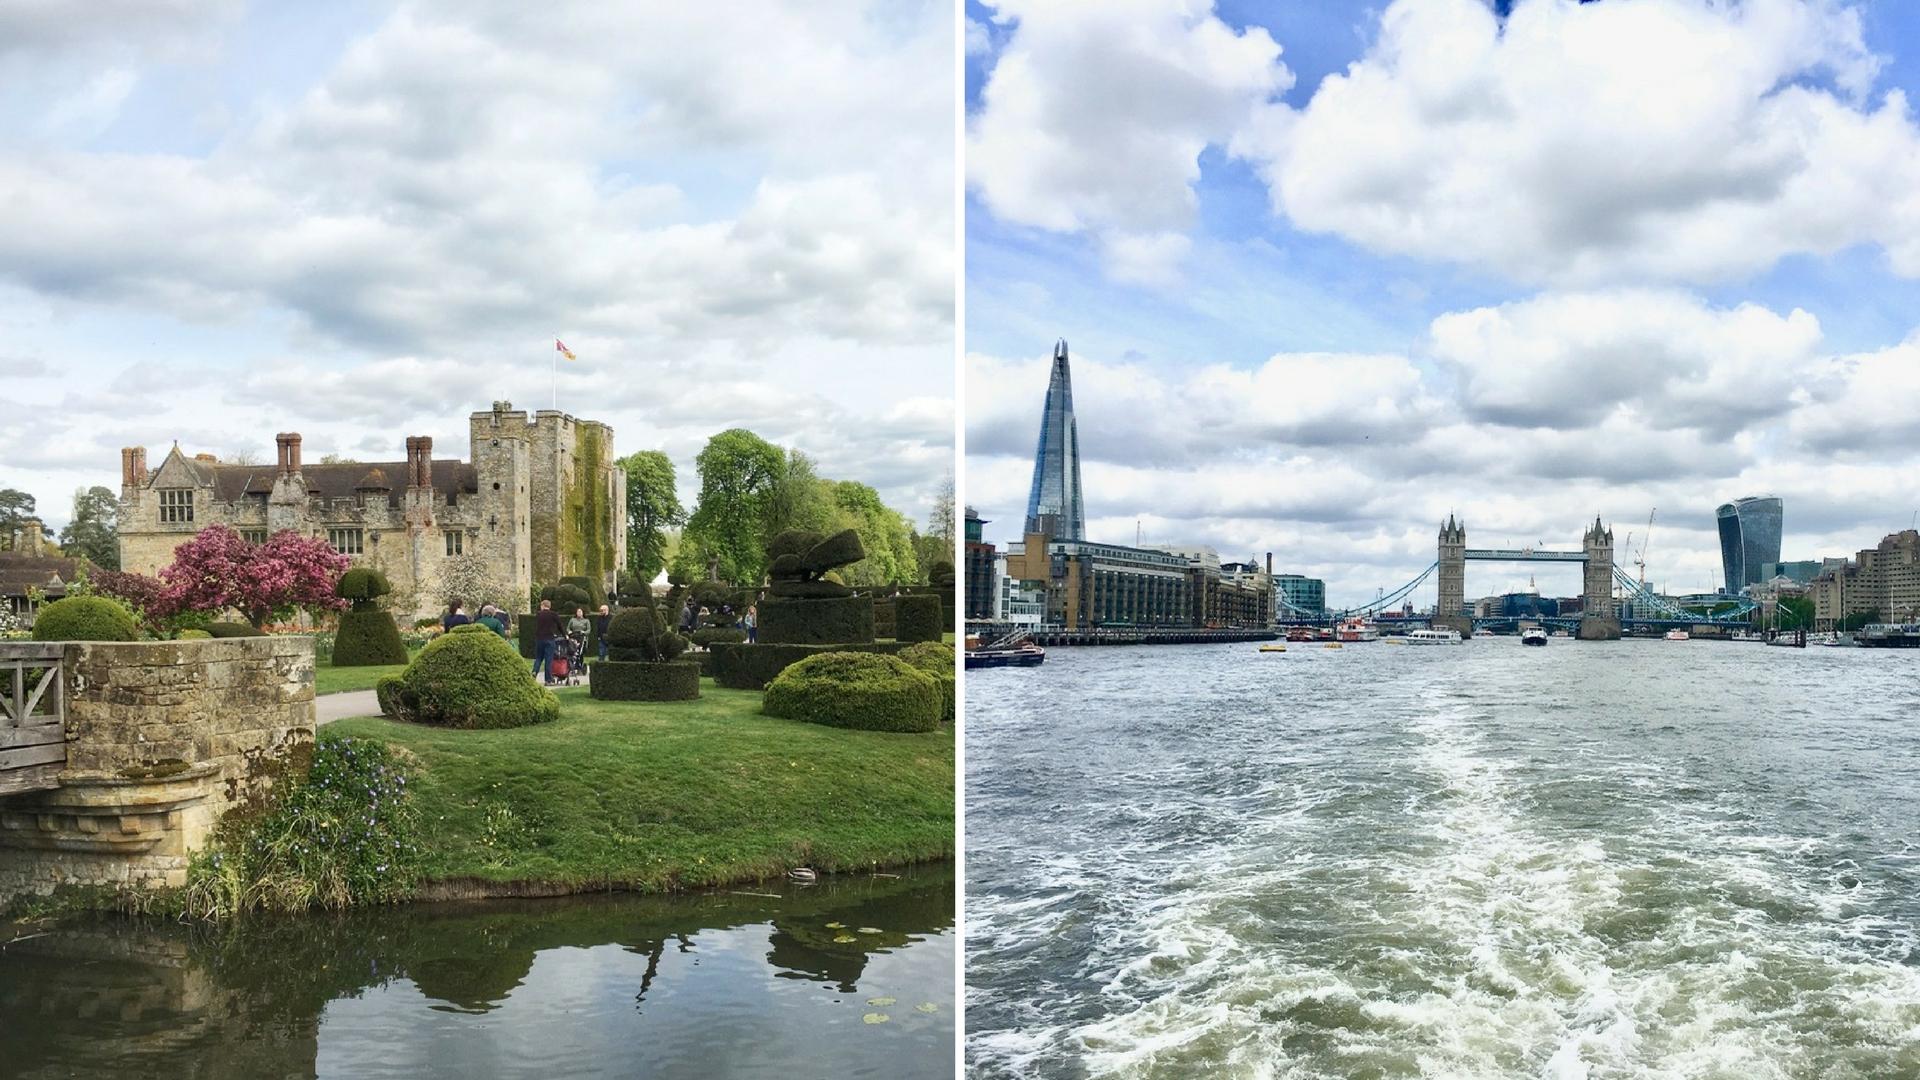 Hever Castle, Thames River, London